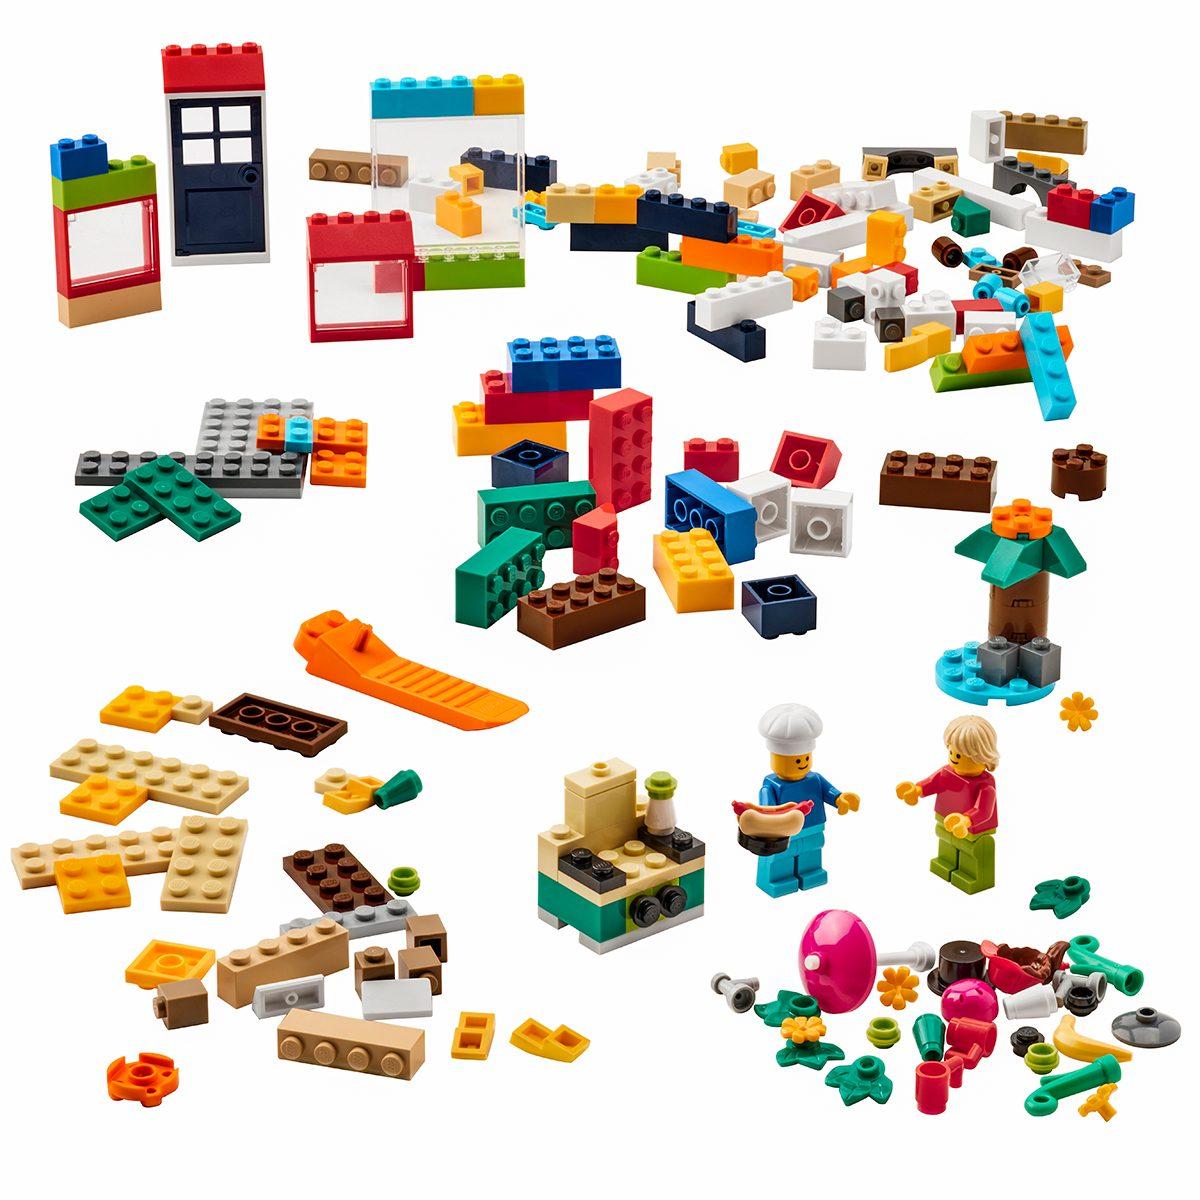 IKEA LEGO Bygglek Collection LEGO brick set